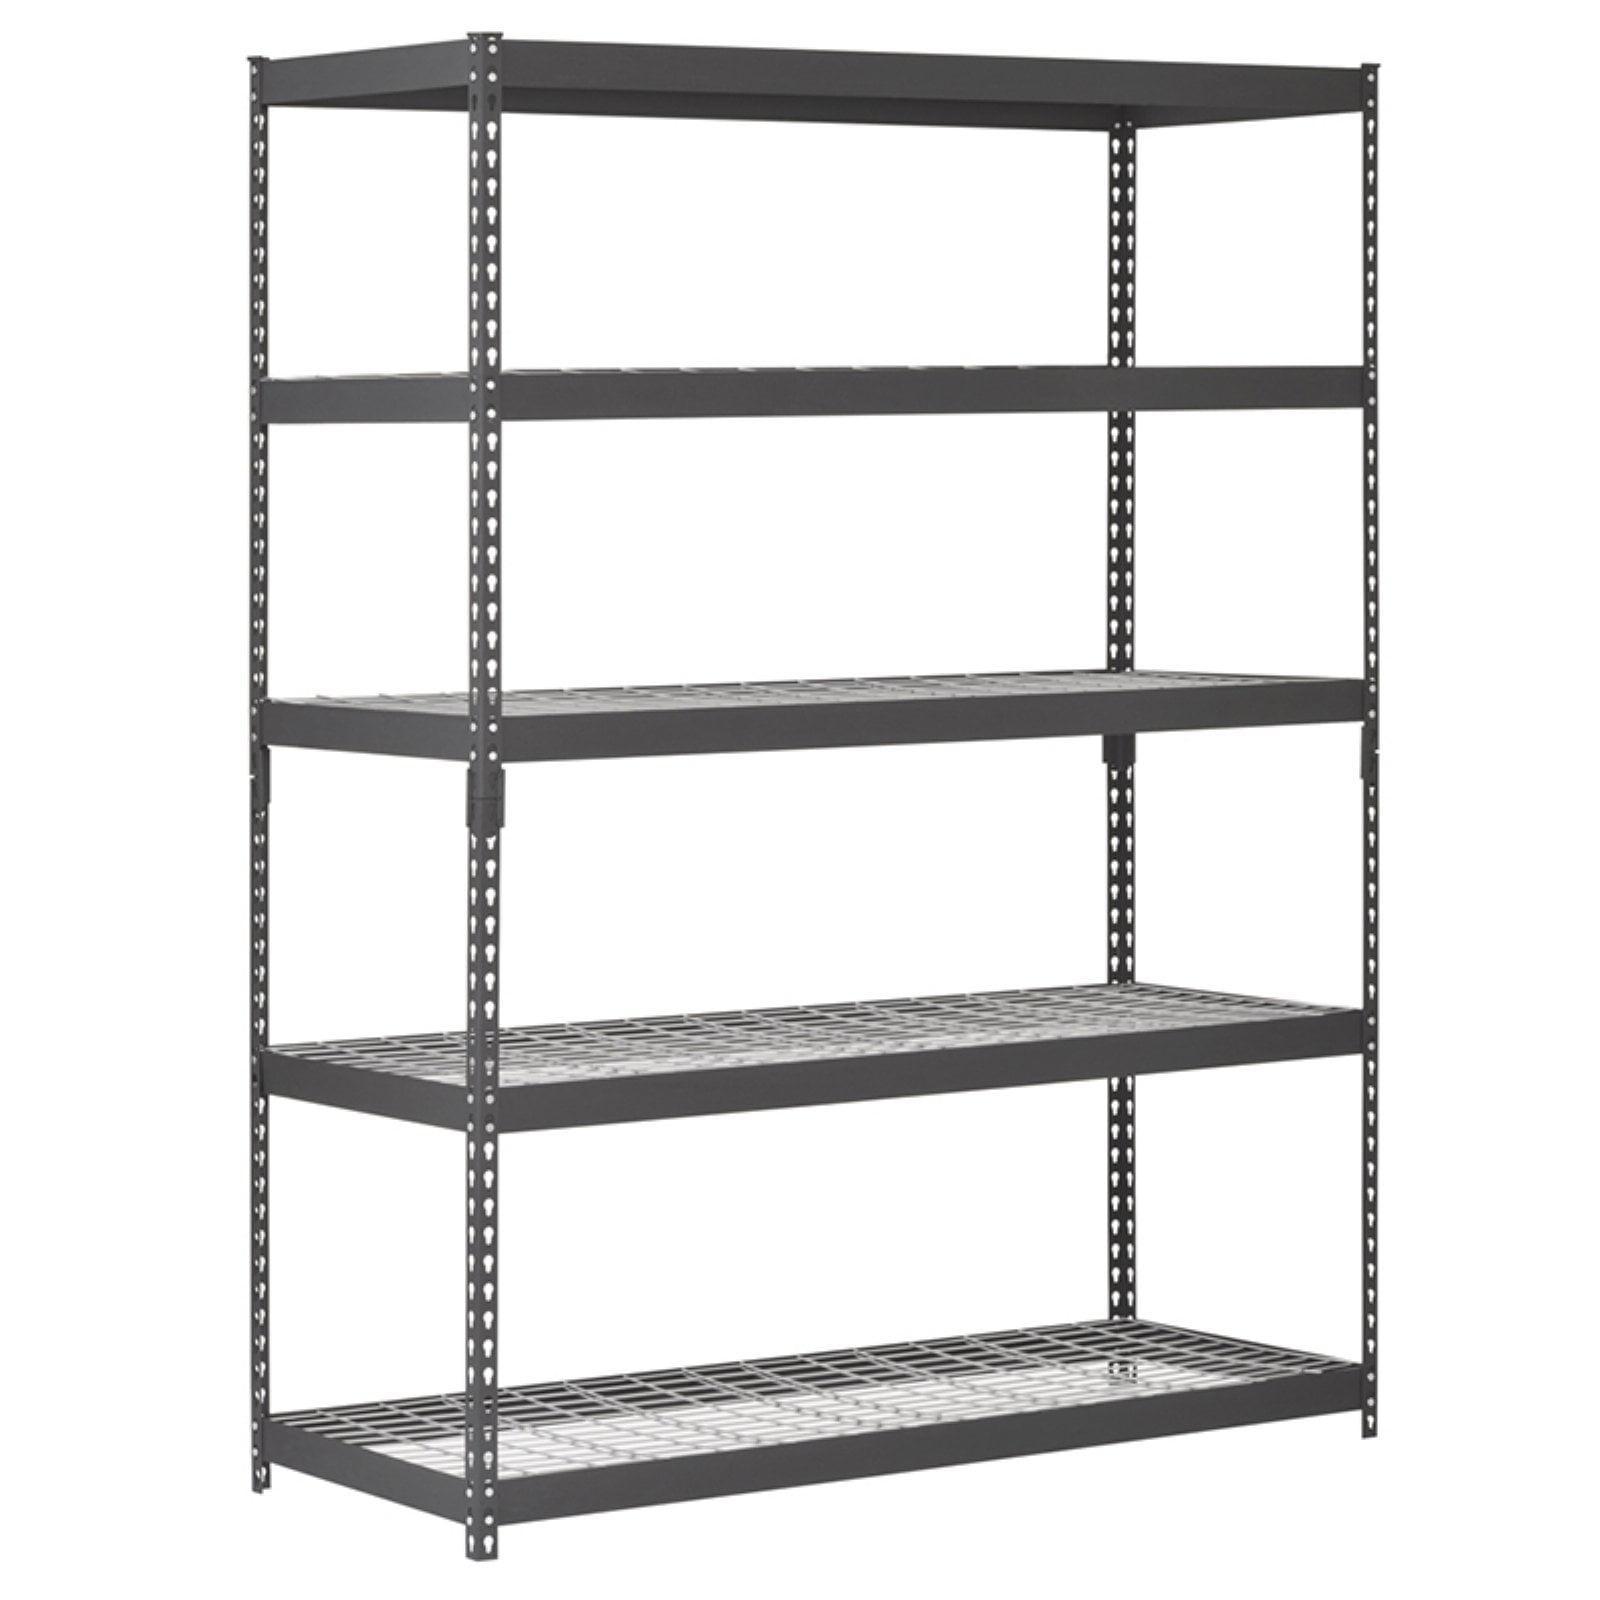 Muscle Rack 60 W X 24 D X 78 H 5 Shelf Heavy Duty Steel Shelving Unit 4000 Lb Capacity Black Walmart Com